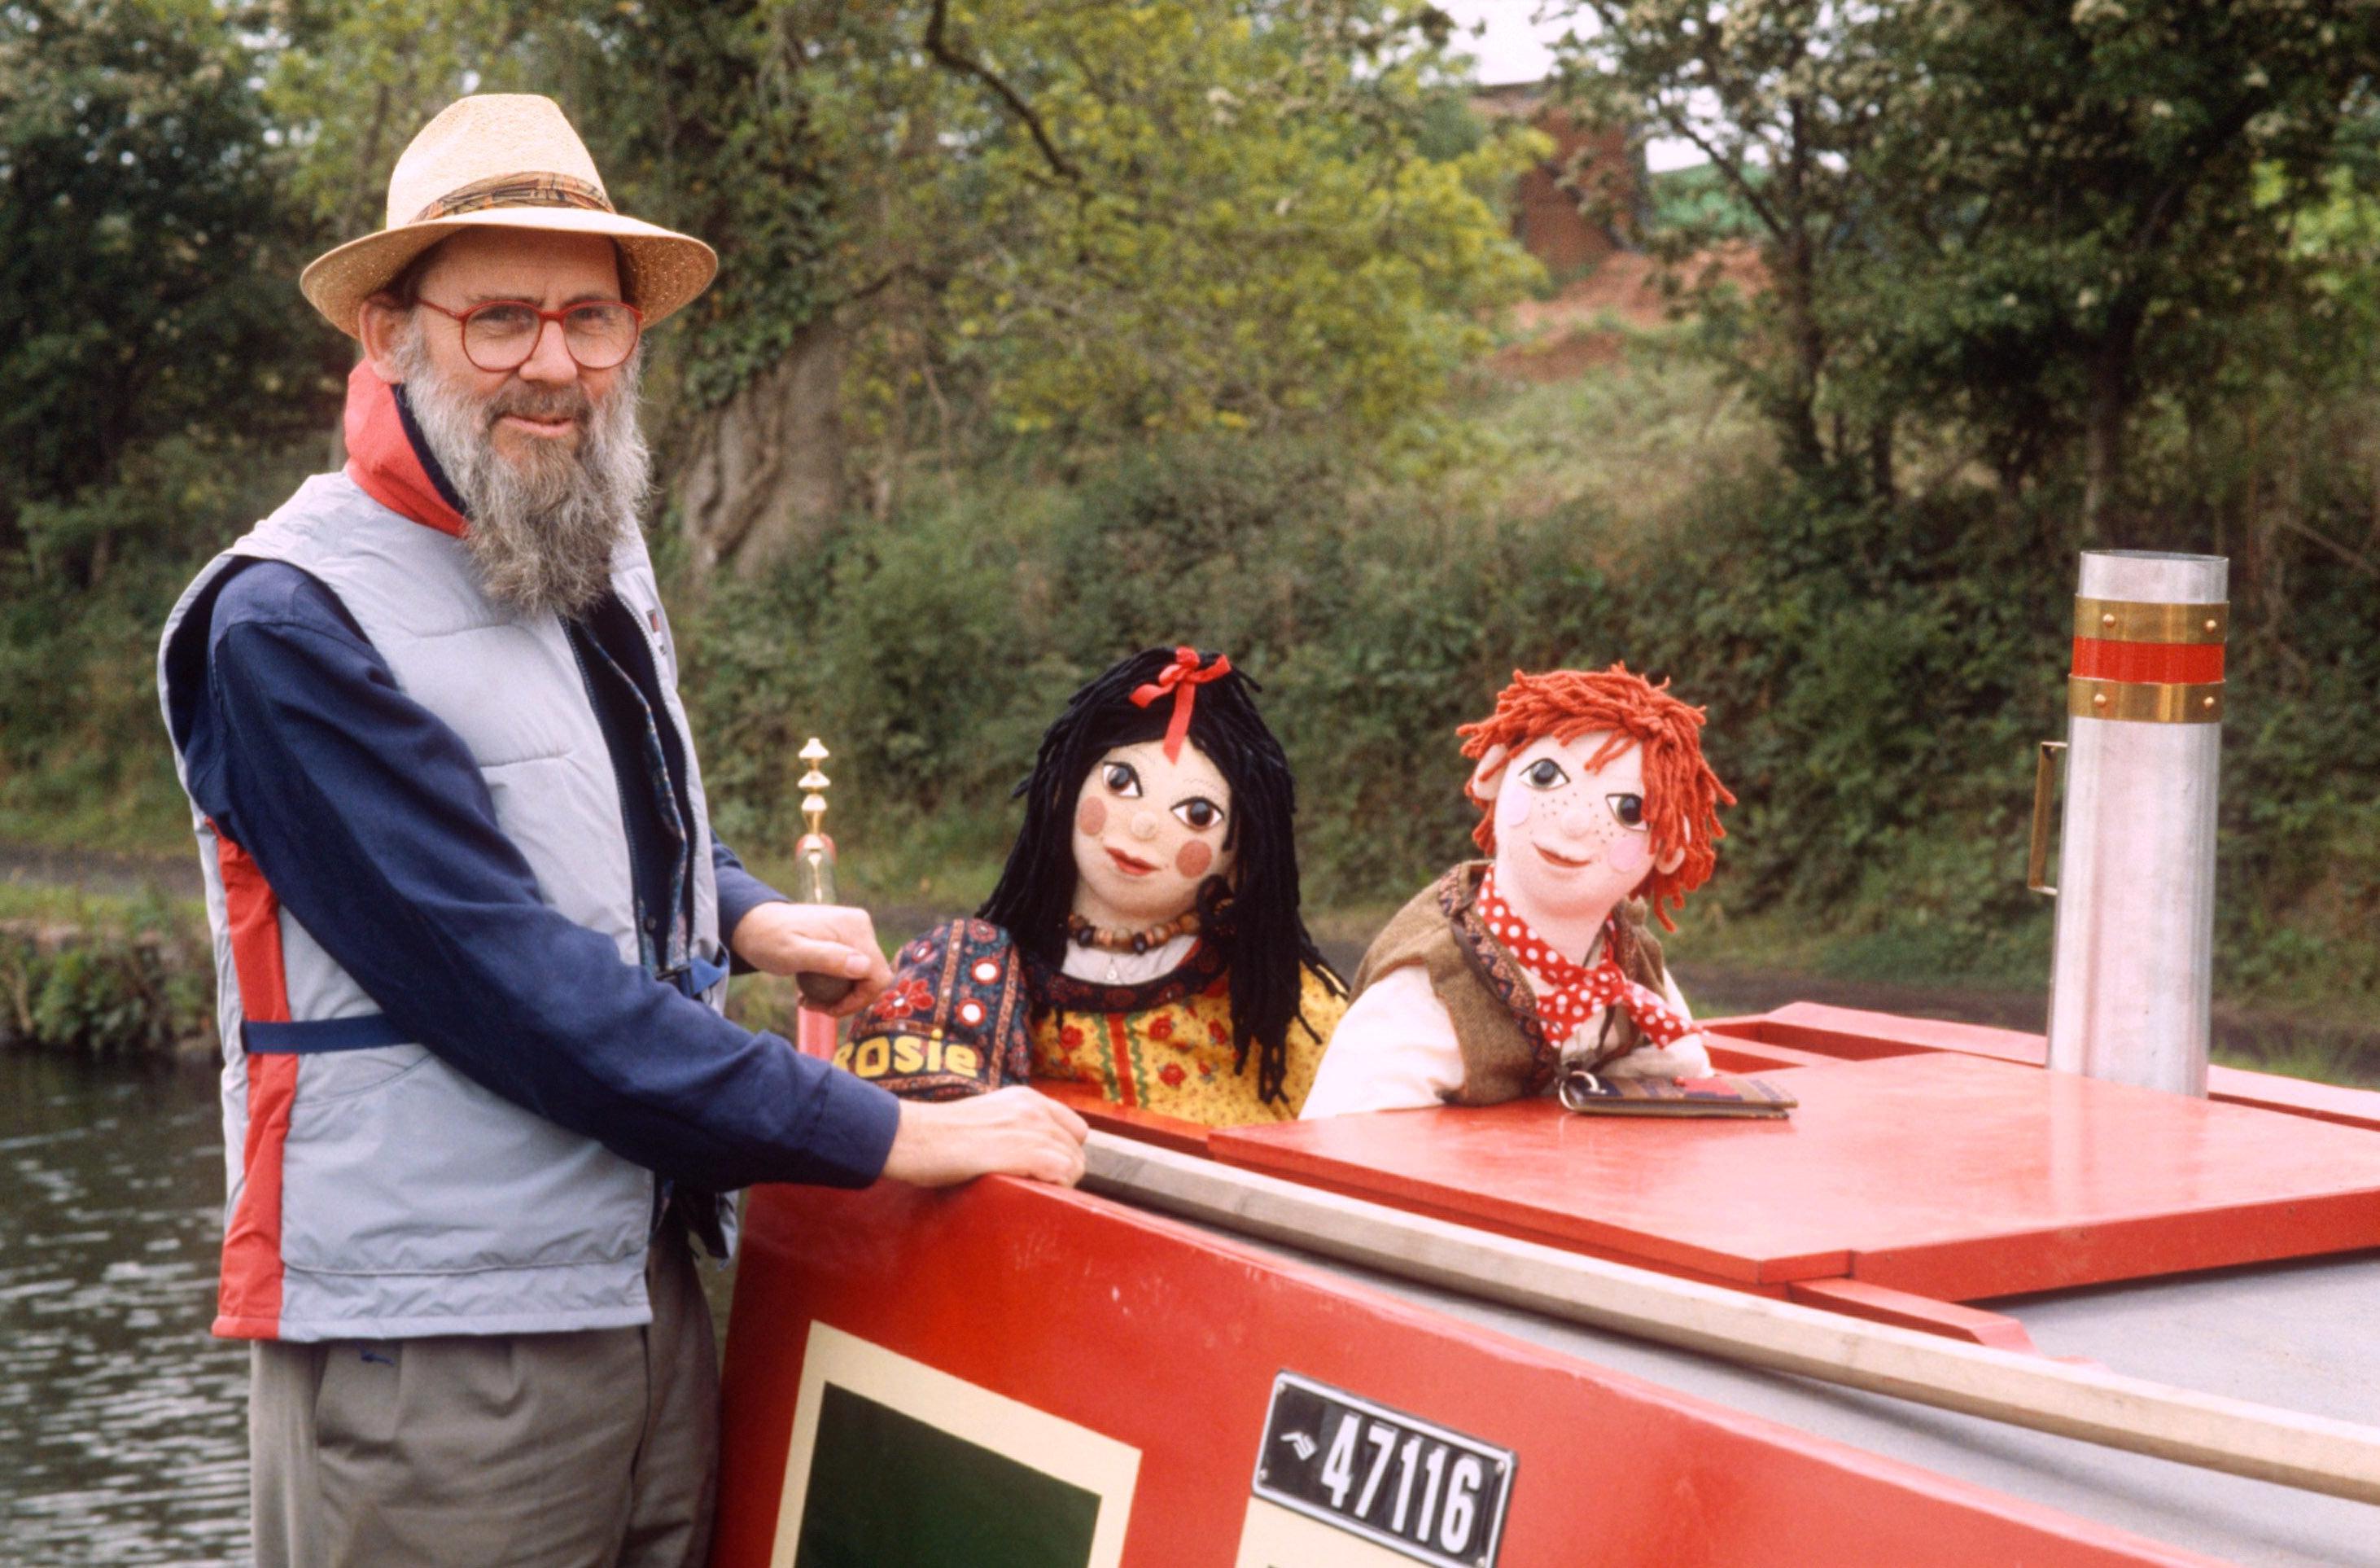 Postman Pat creator John Cunliffe has died aged 85